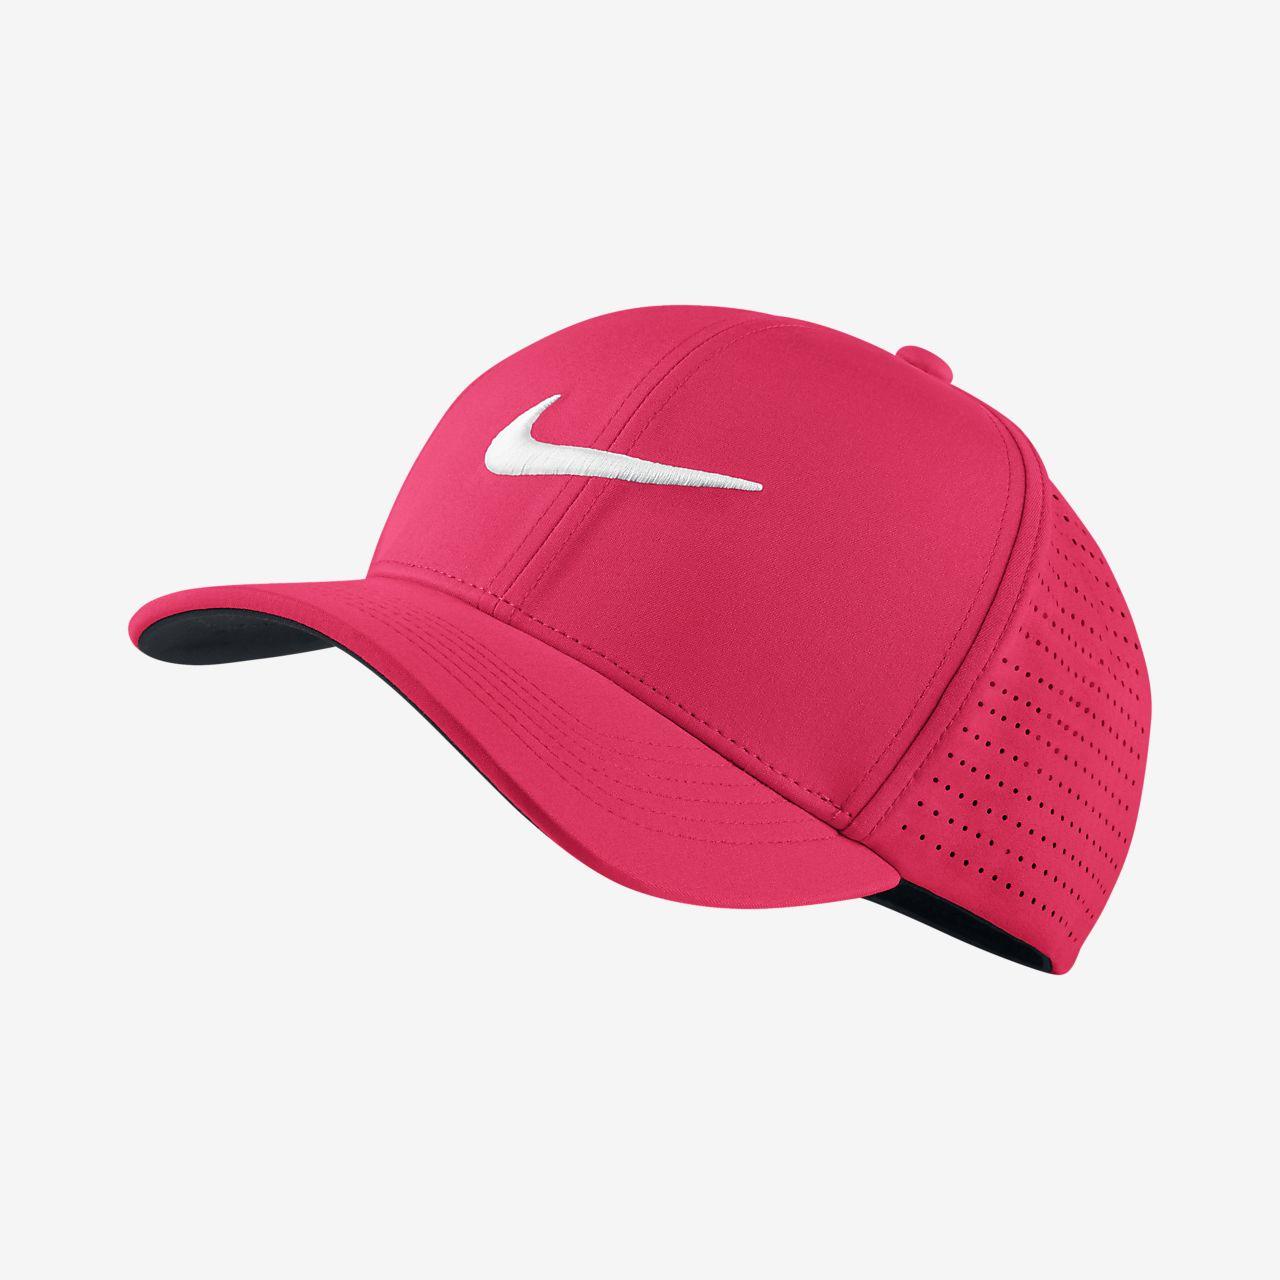 7a06314a70c Nike AeroBill Classic 99 Fitted Golf Hat. Nike.com CA